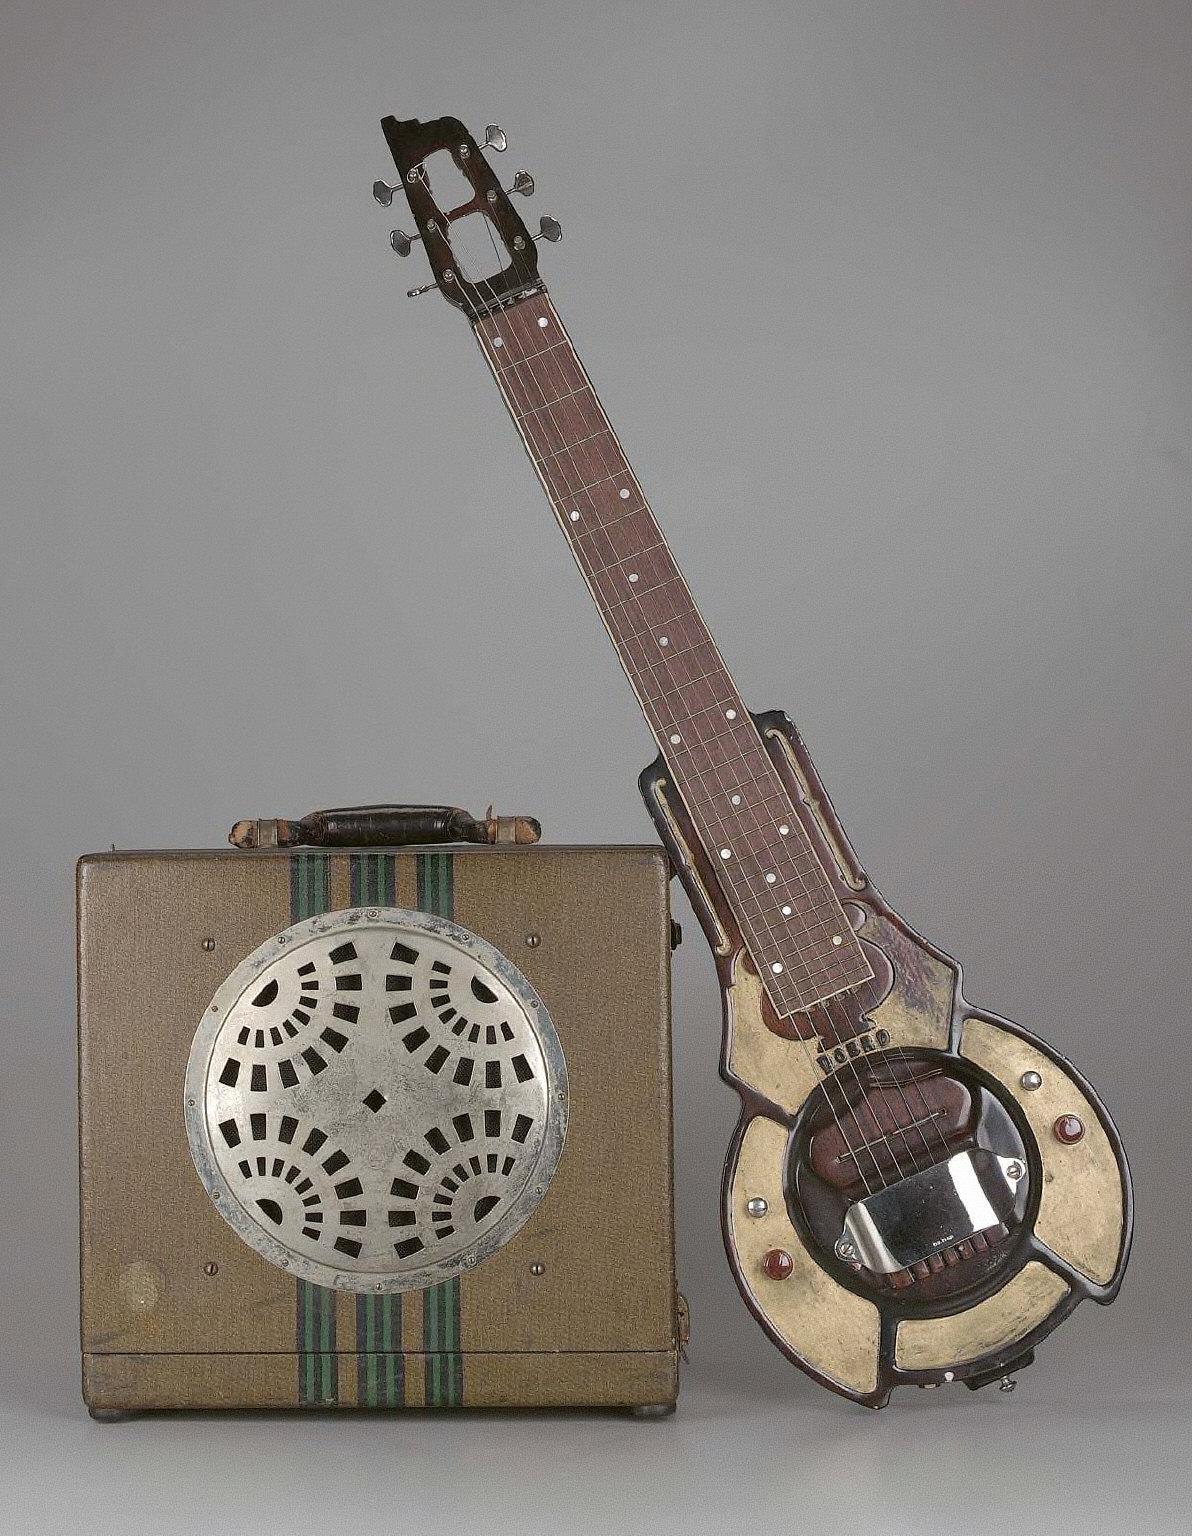 Lap steel guitar and amplifier (No. 1 Hawaiian guitar model)